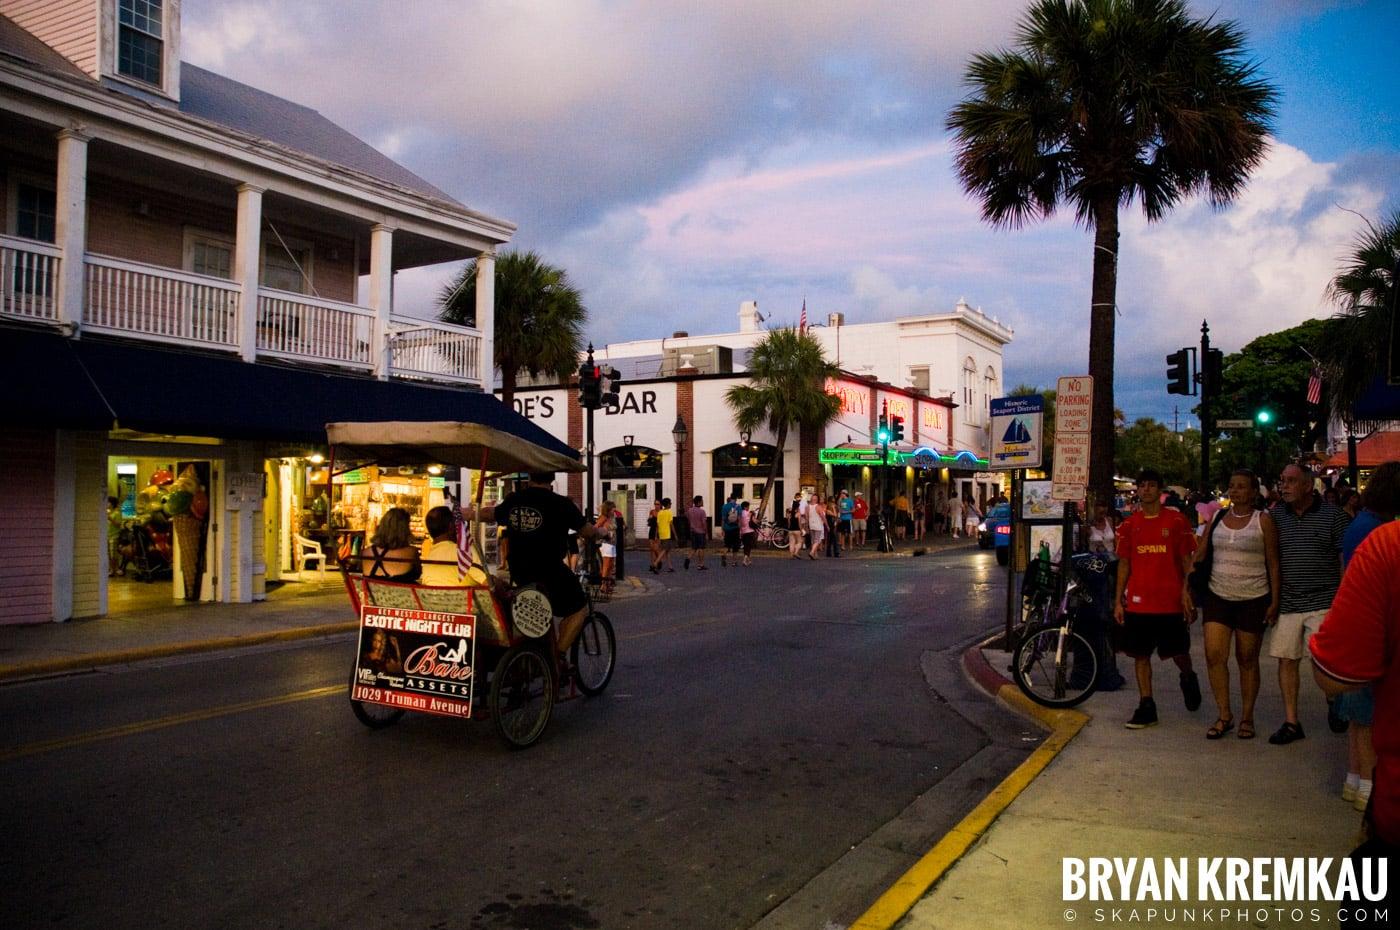 Florida Keys Vacation - 7.09.10 - 7.15.10 (13)